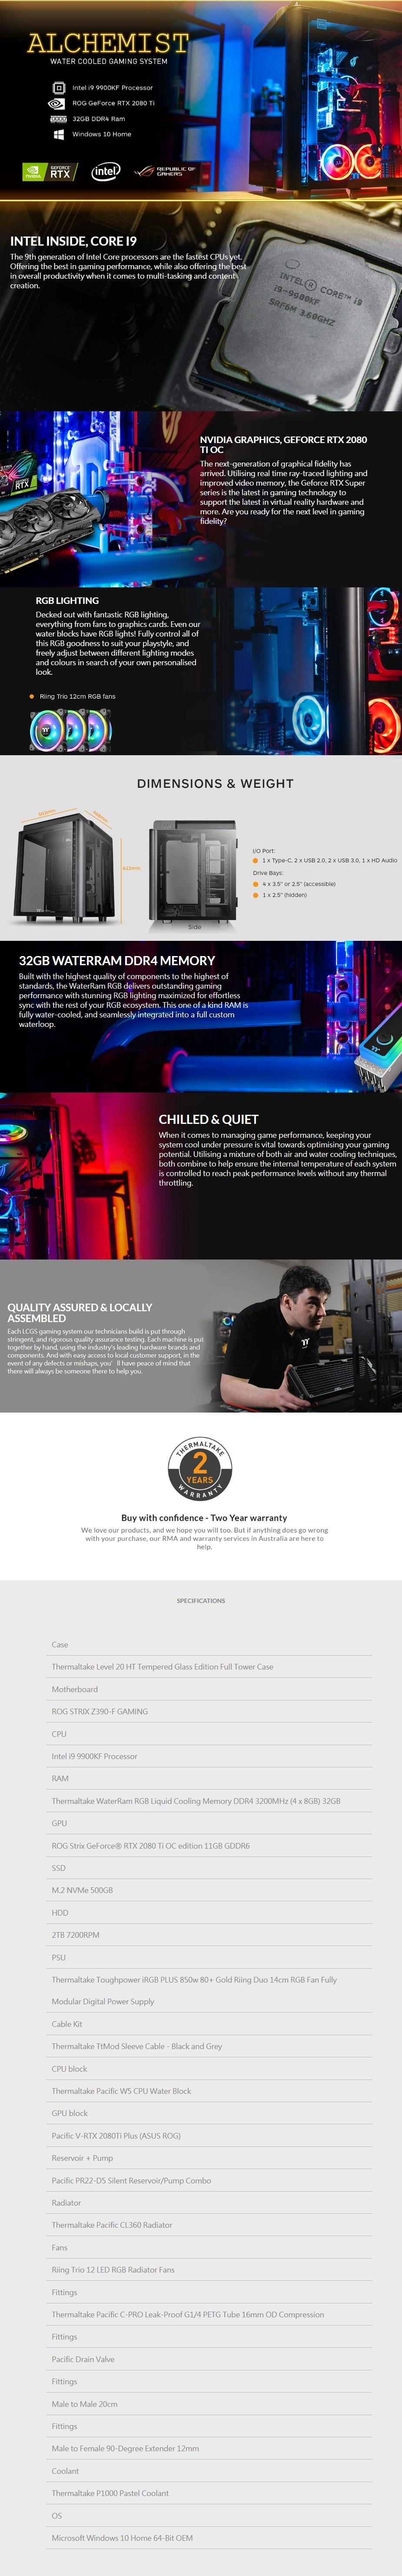 Thermaltake LCGS Alchemist Gaming PC i9-9900KF 32GB 500GB+2TB RTX2080Ti W10H - Overview 1